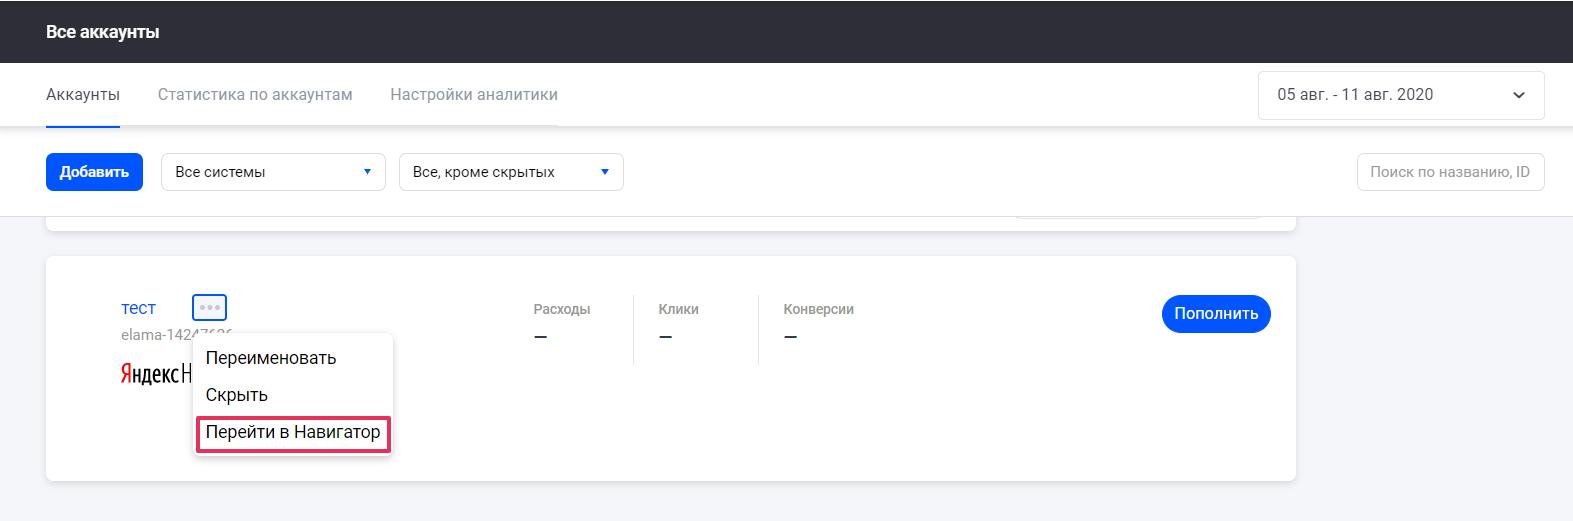 Вход в аккаунт Яндекс.Навигатора через карточку аккаунта